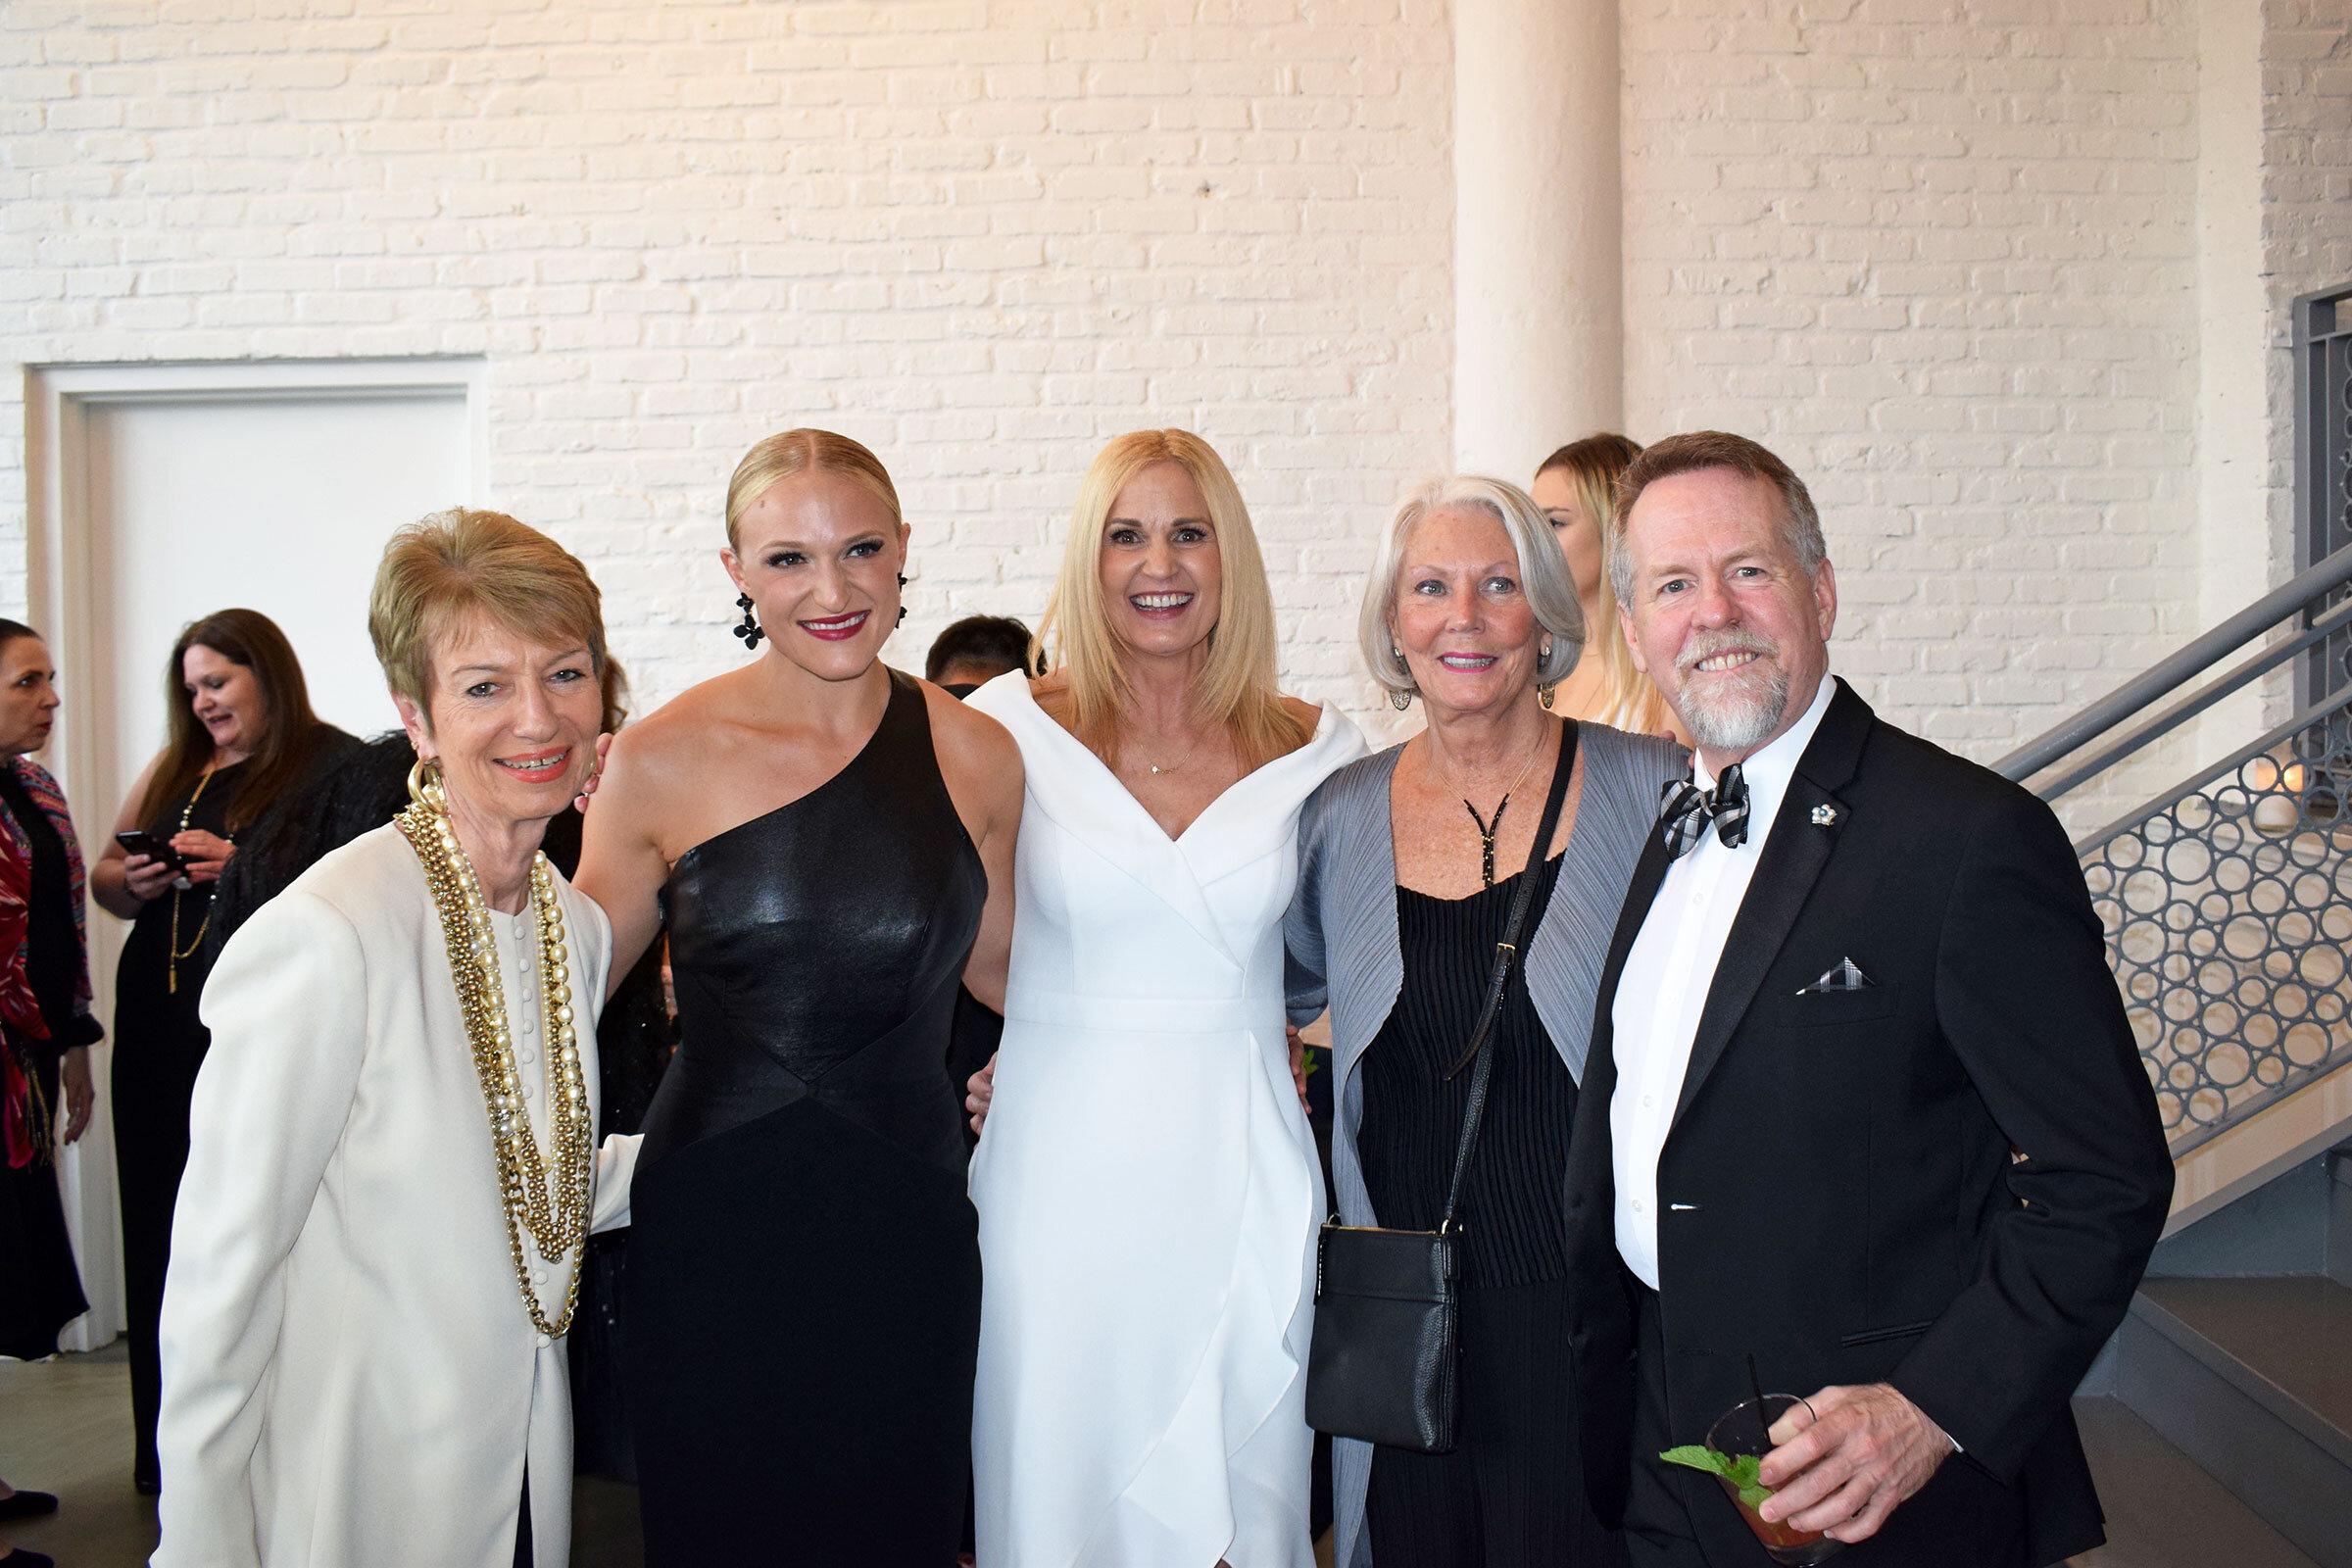 Marsha Dowd, Lauren Giordano Curran,  Amy Giordano, Pam Crutchfield